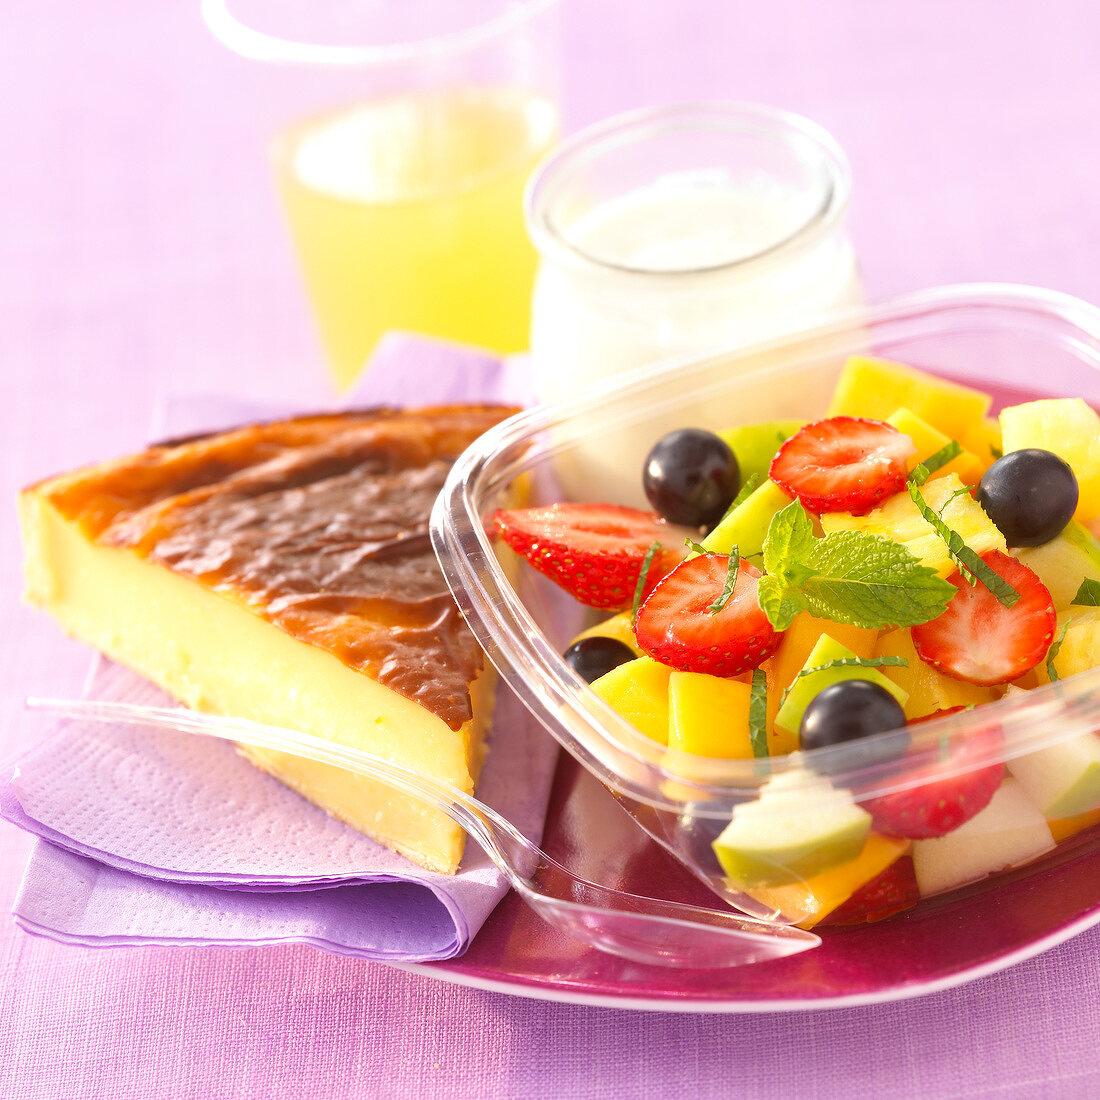 Fresh fruit salad,a slice of flan,a glass of orange juice and a yoghurt